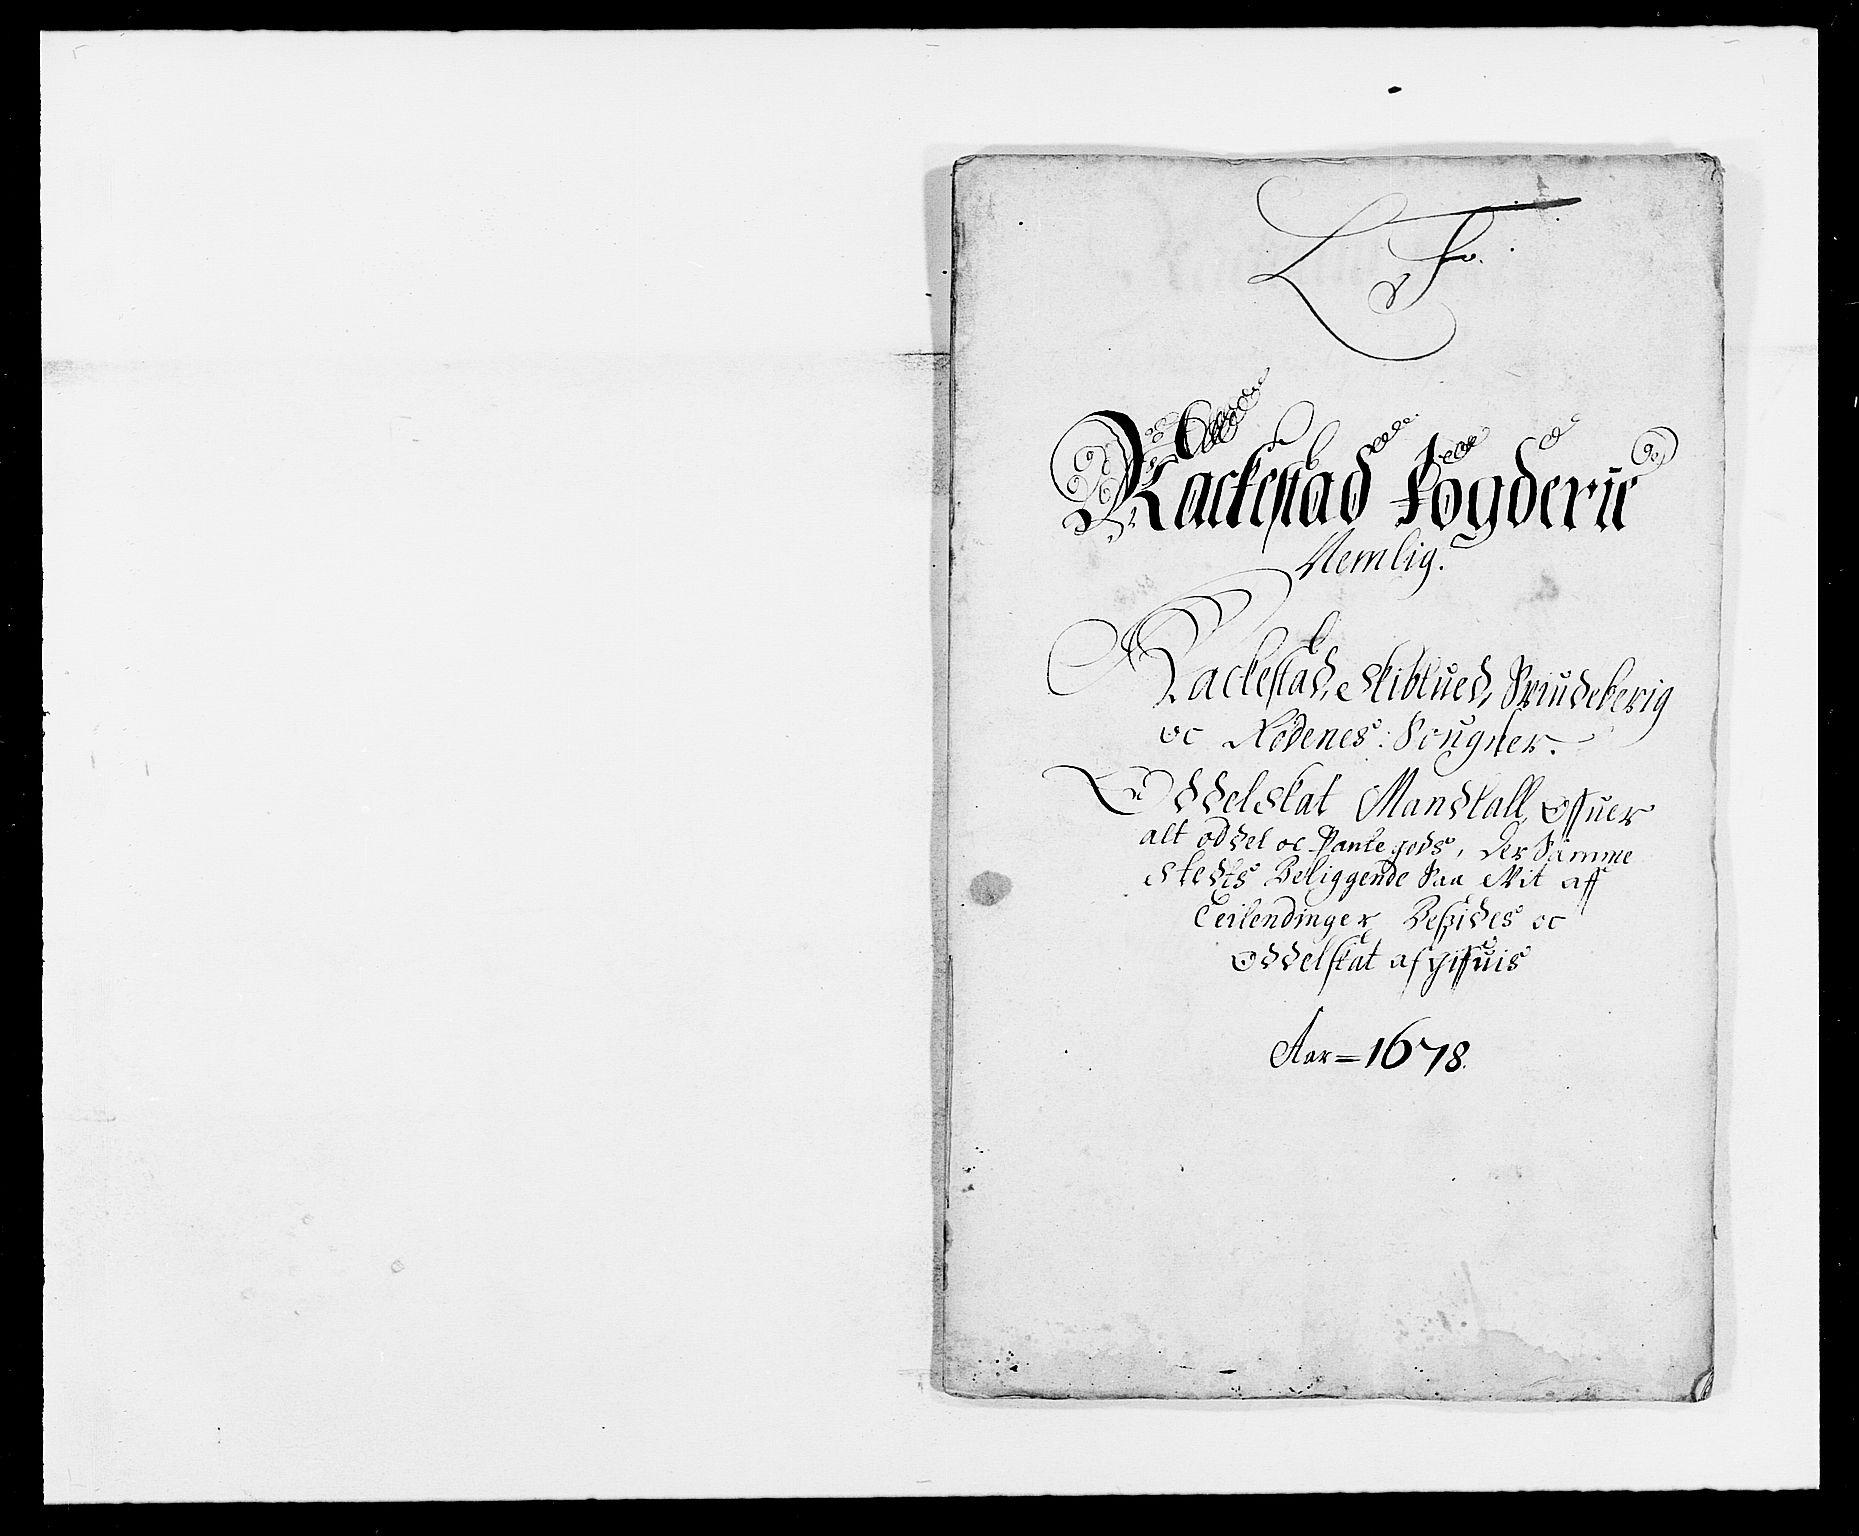 RA, Rentekammeret inntil 1814, Reviderte regnskaper, Fogderegnskap, R05/L0271: Fogderegnskap Rakkestad, 1678-1679, s. 146